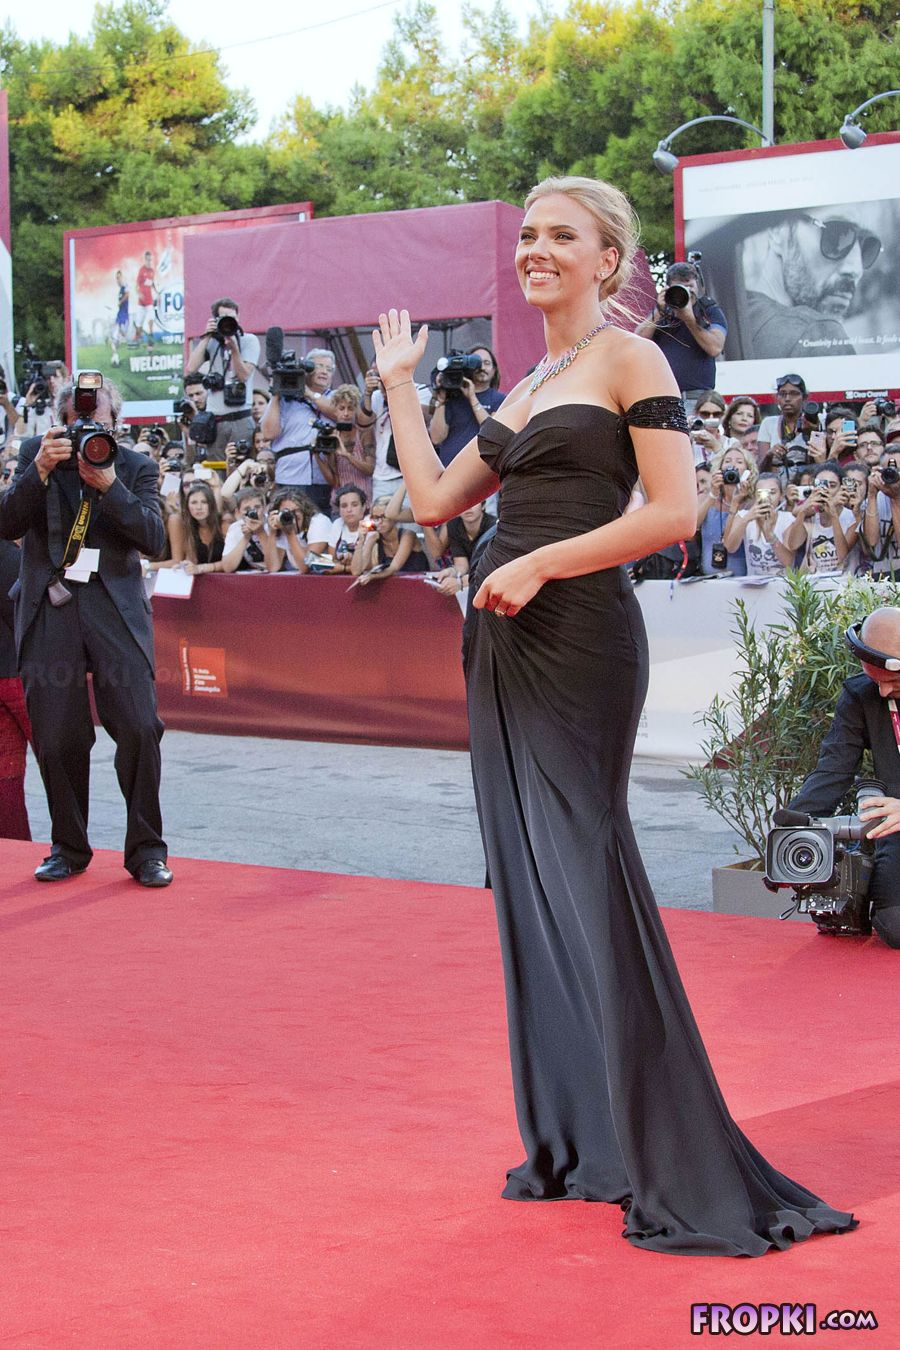 Scarlett Johansson Fropki 36